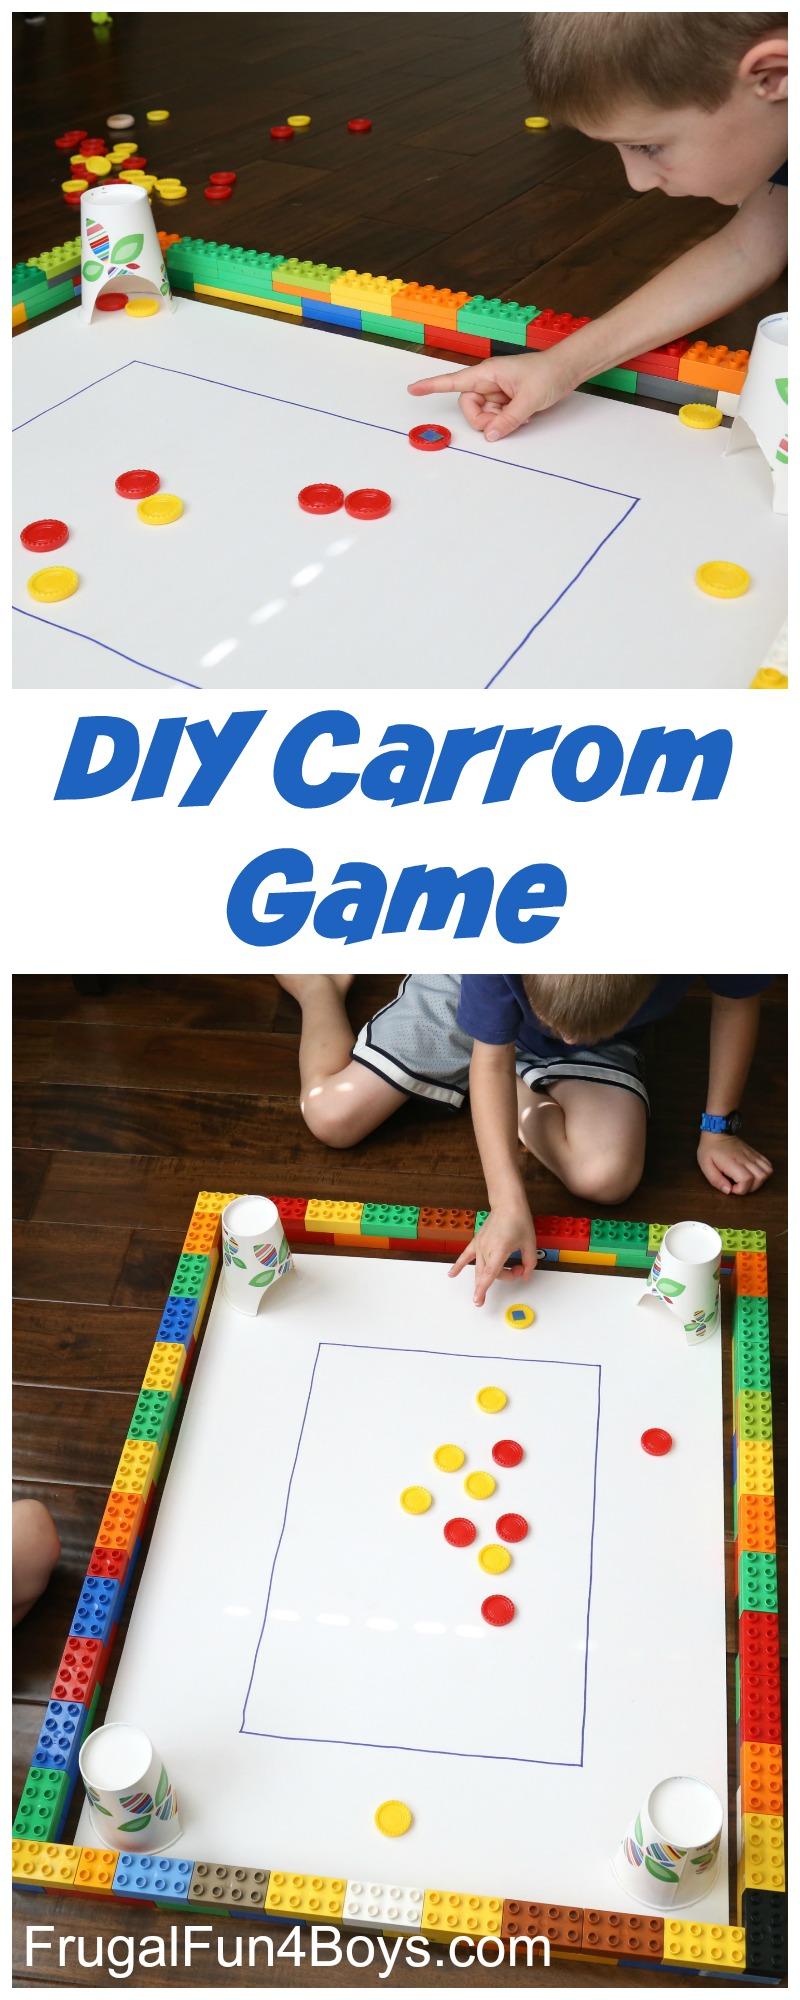 Homemade Carrom Game for Kids